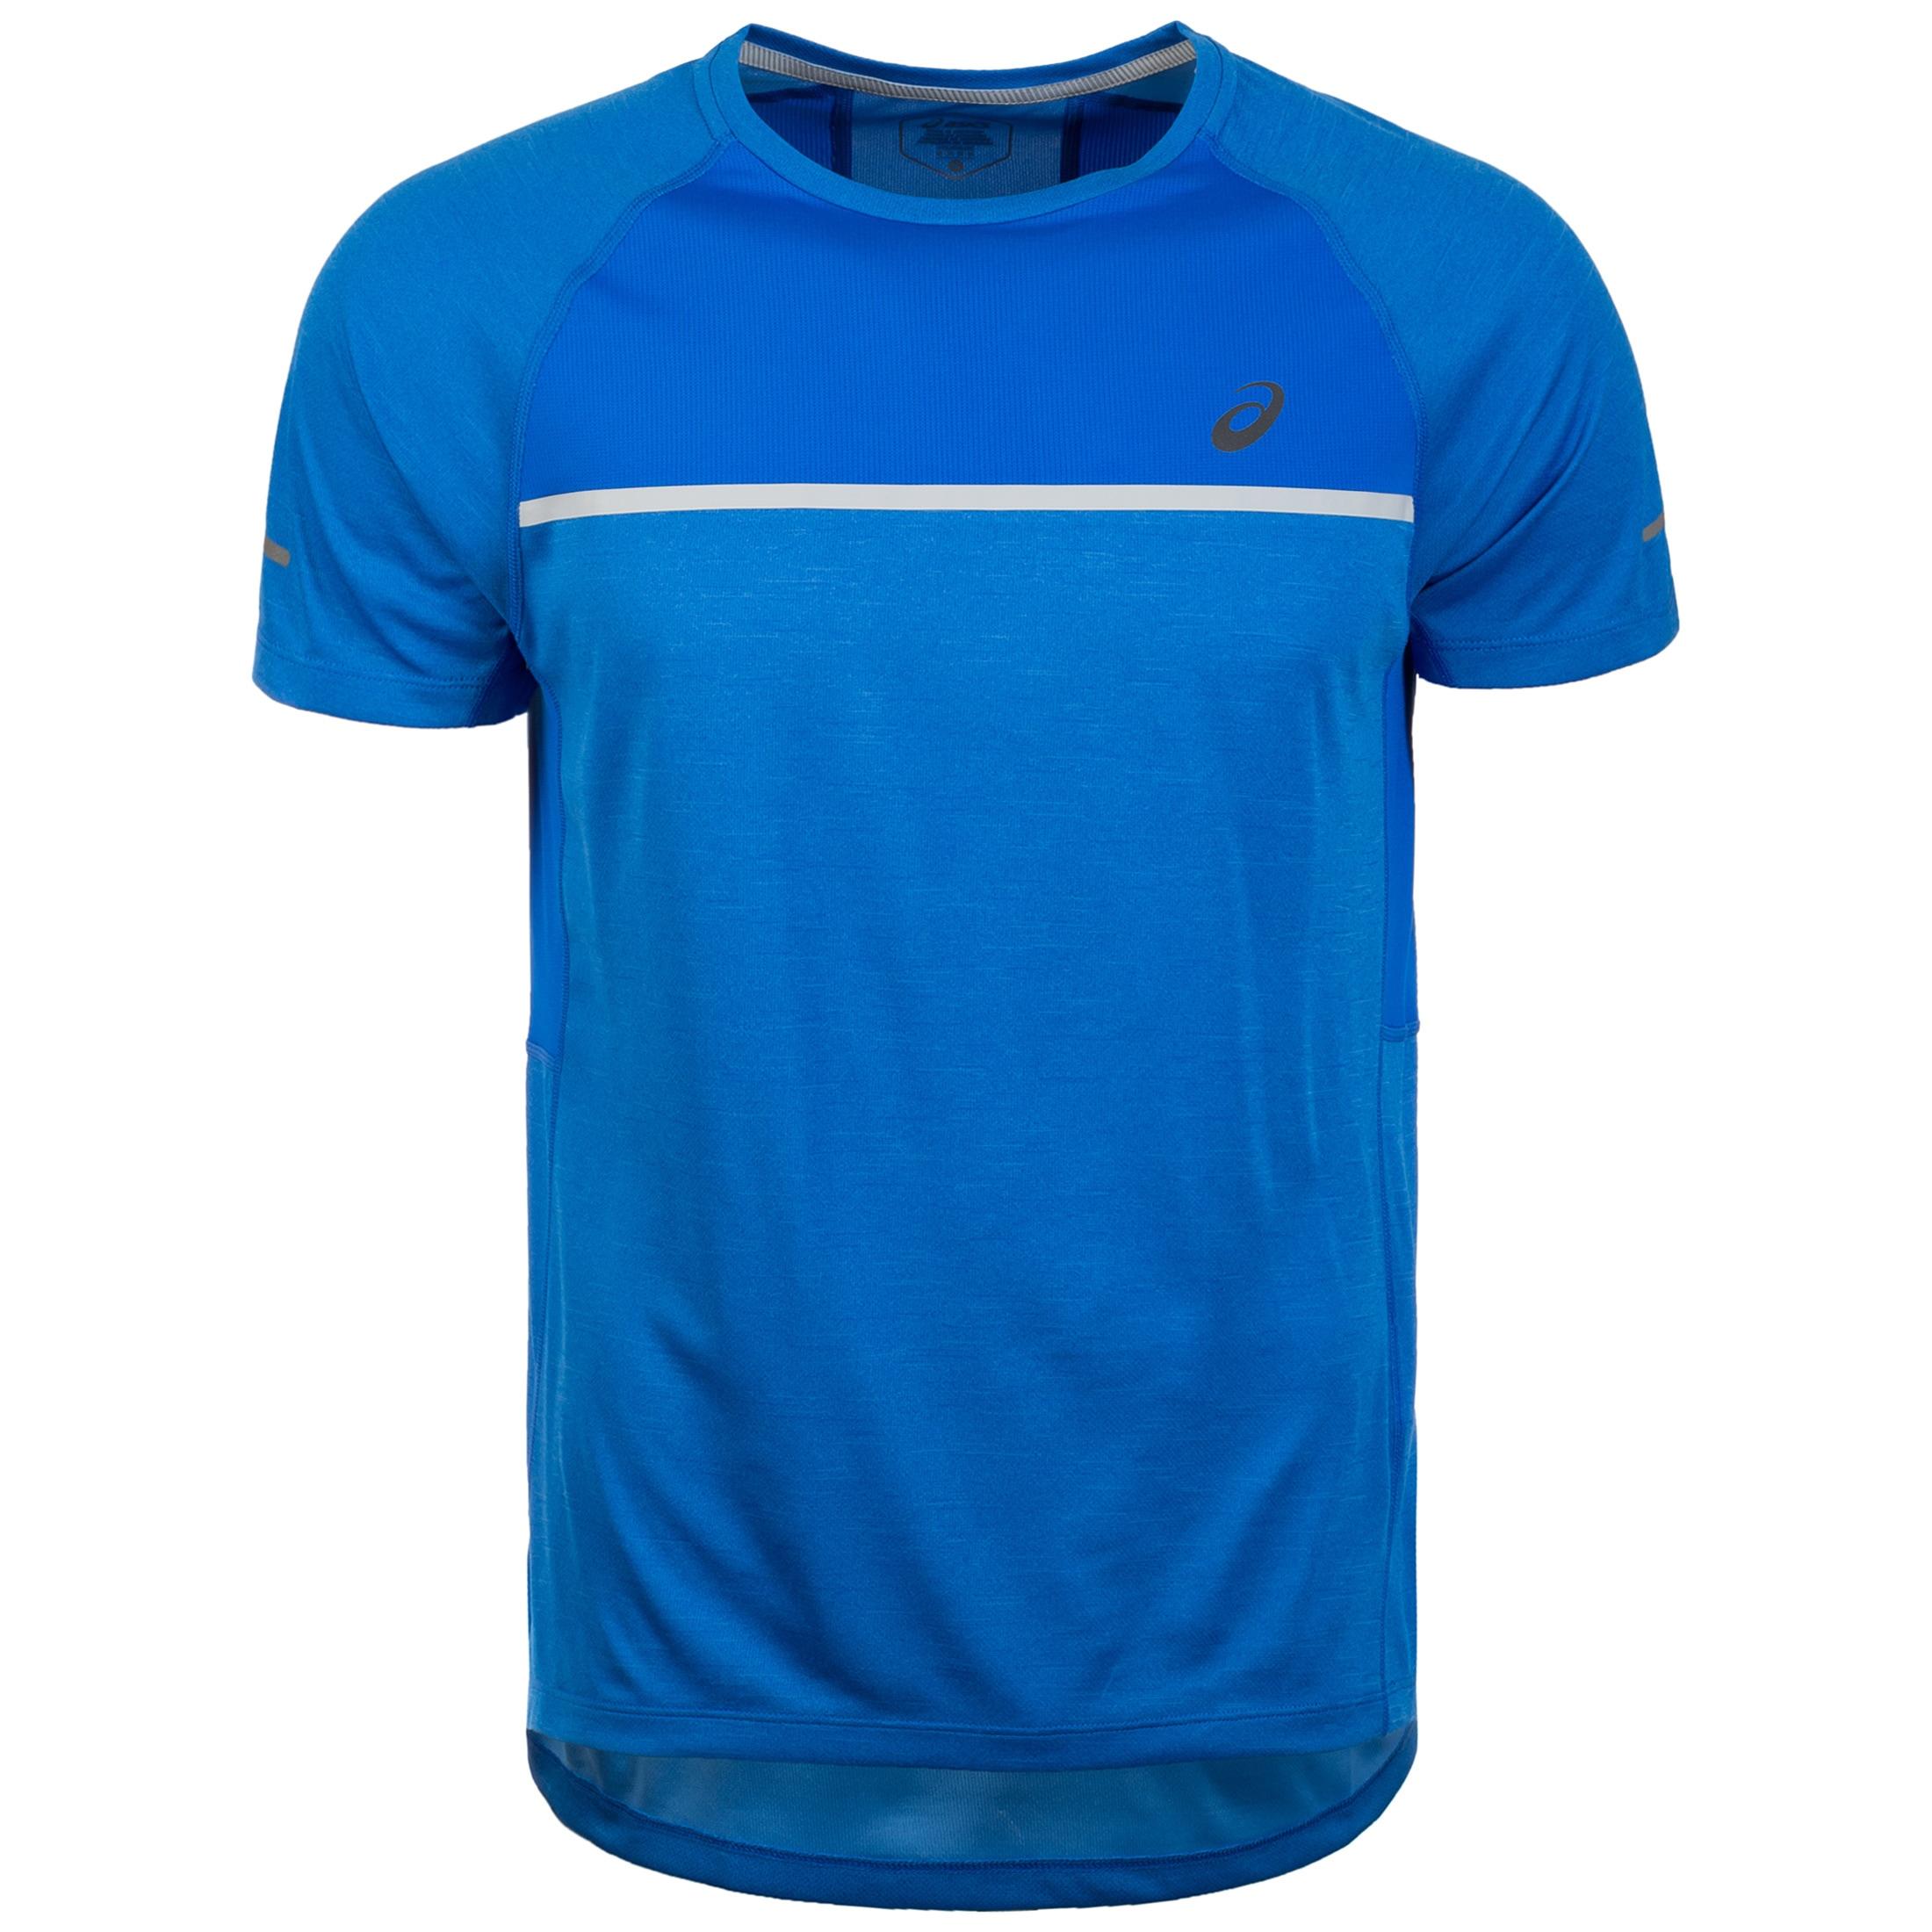 Asics Laufshirt Top   Sportbekleidung > Sportshirts > Laufshirts   ASICS